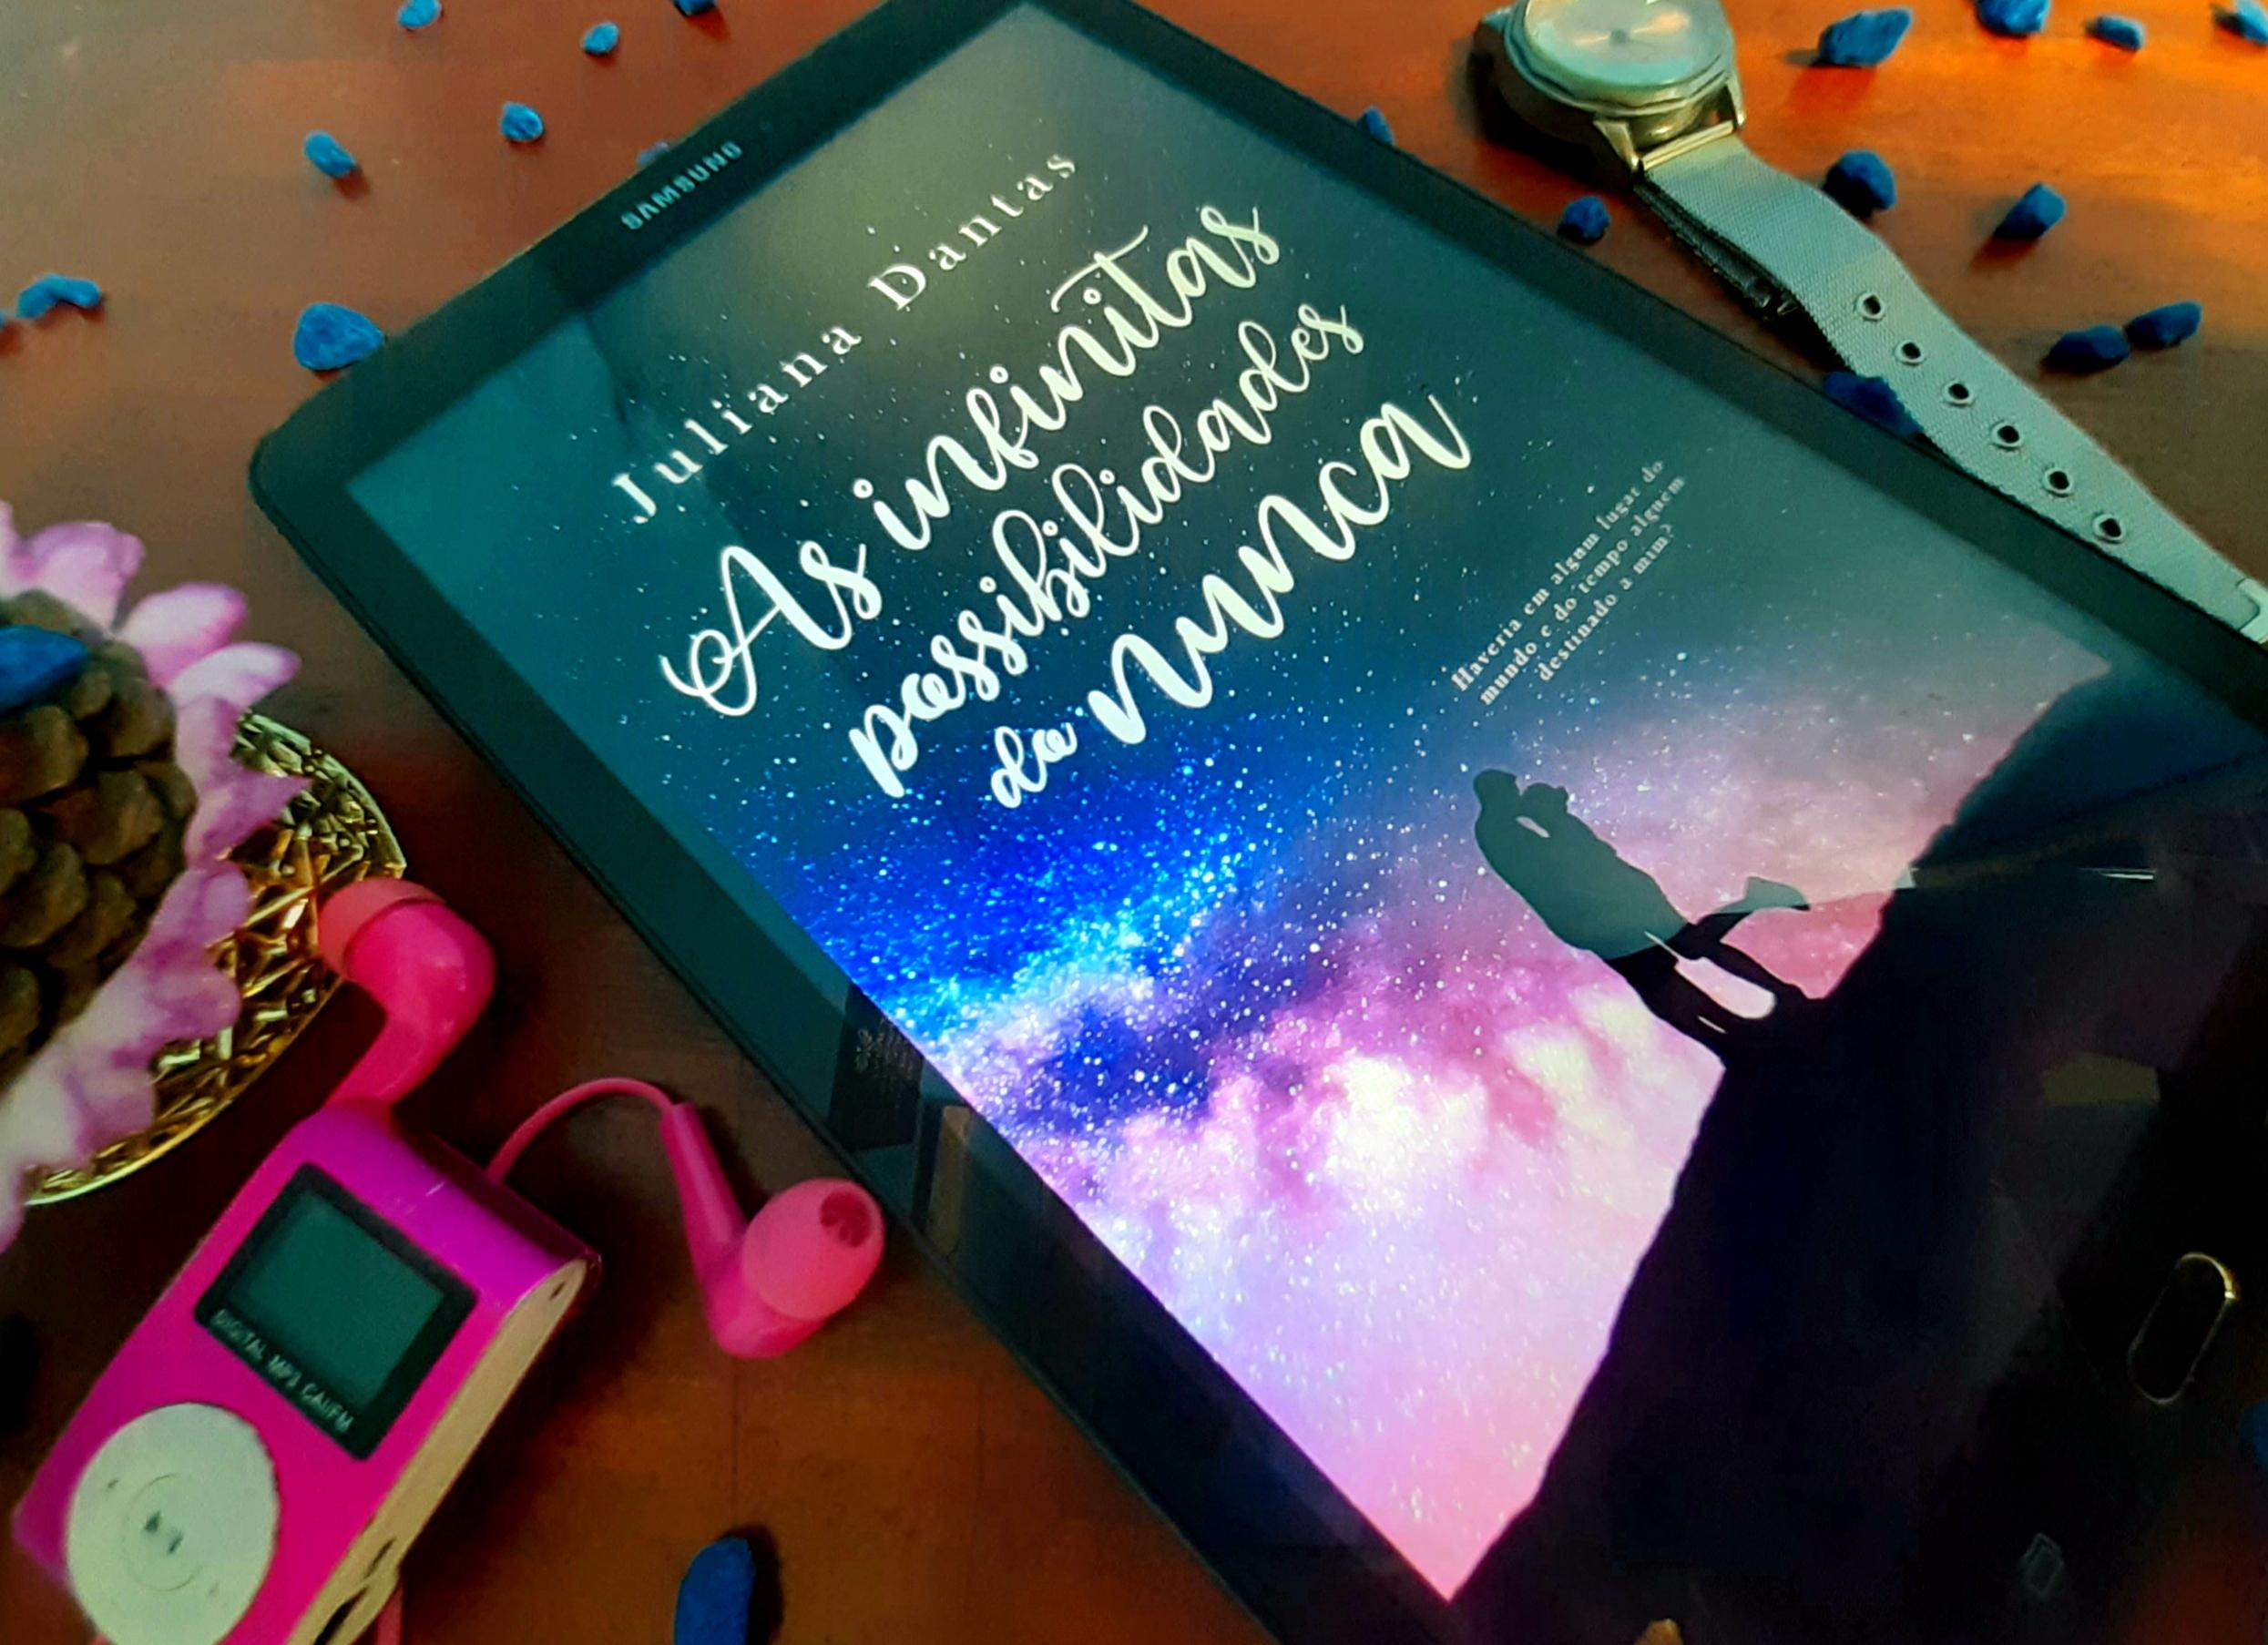 As infinitas possibilidades do nunca, Livro, Resenha, Juliana Dantas, Beleza de Livros